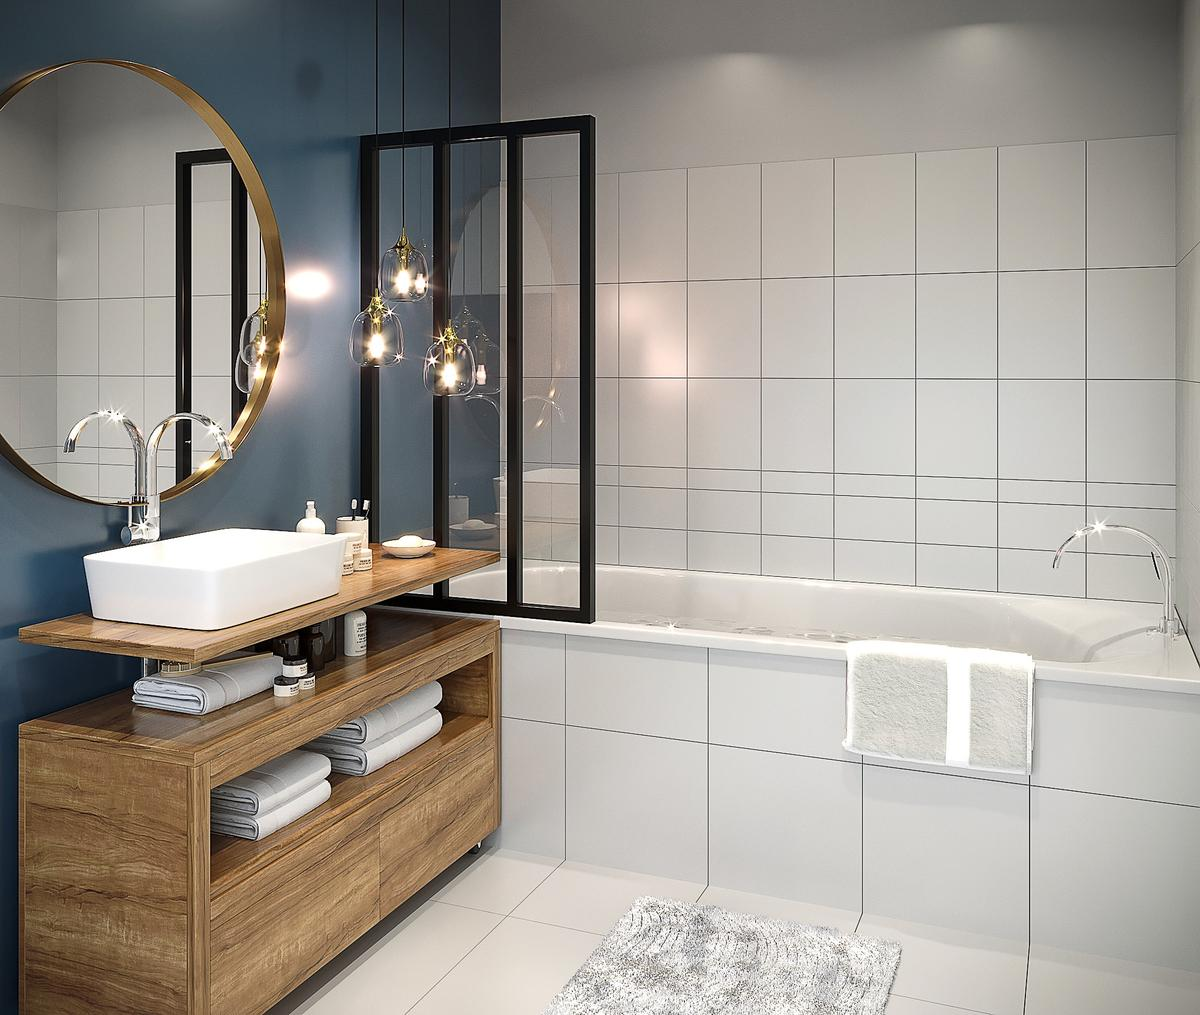 Comment relooker une salle de bains madame figaro - Etabli salle de bain ...